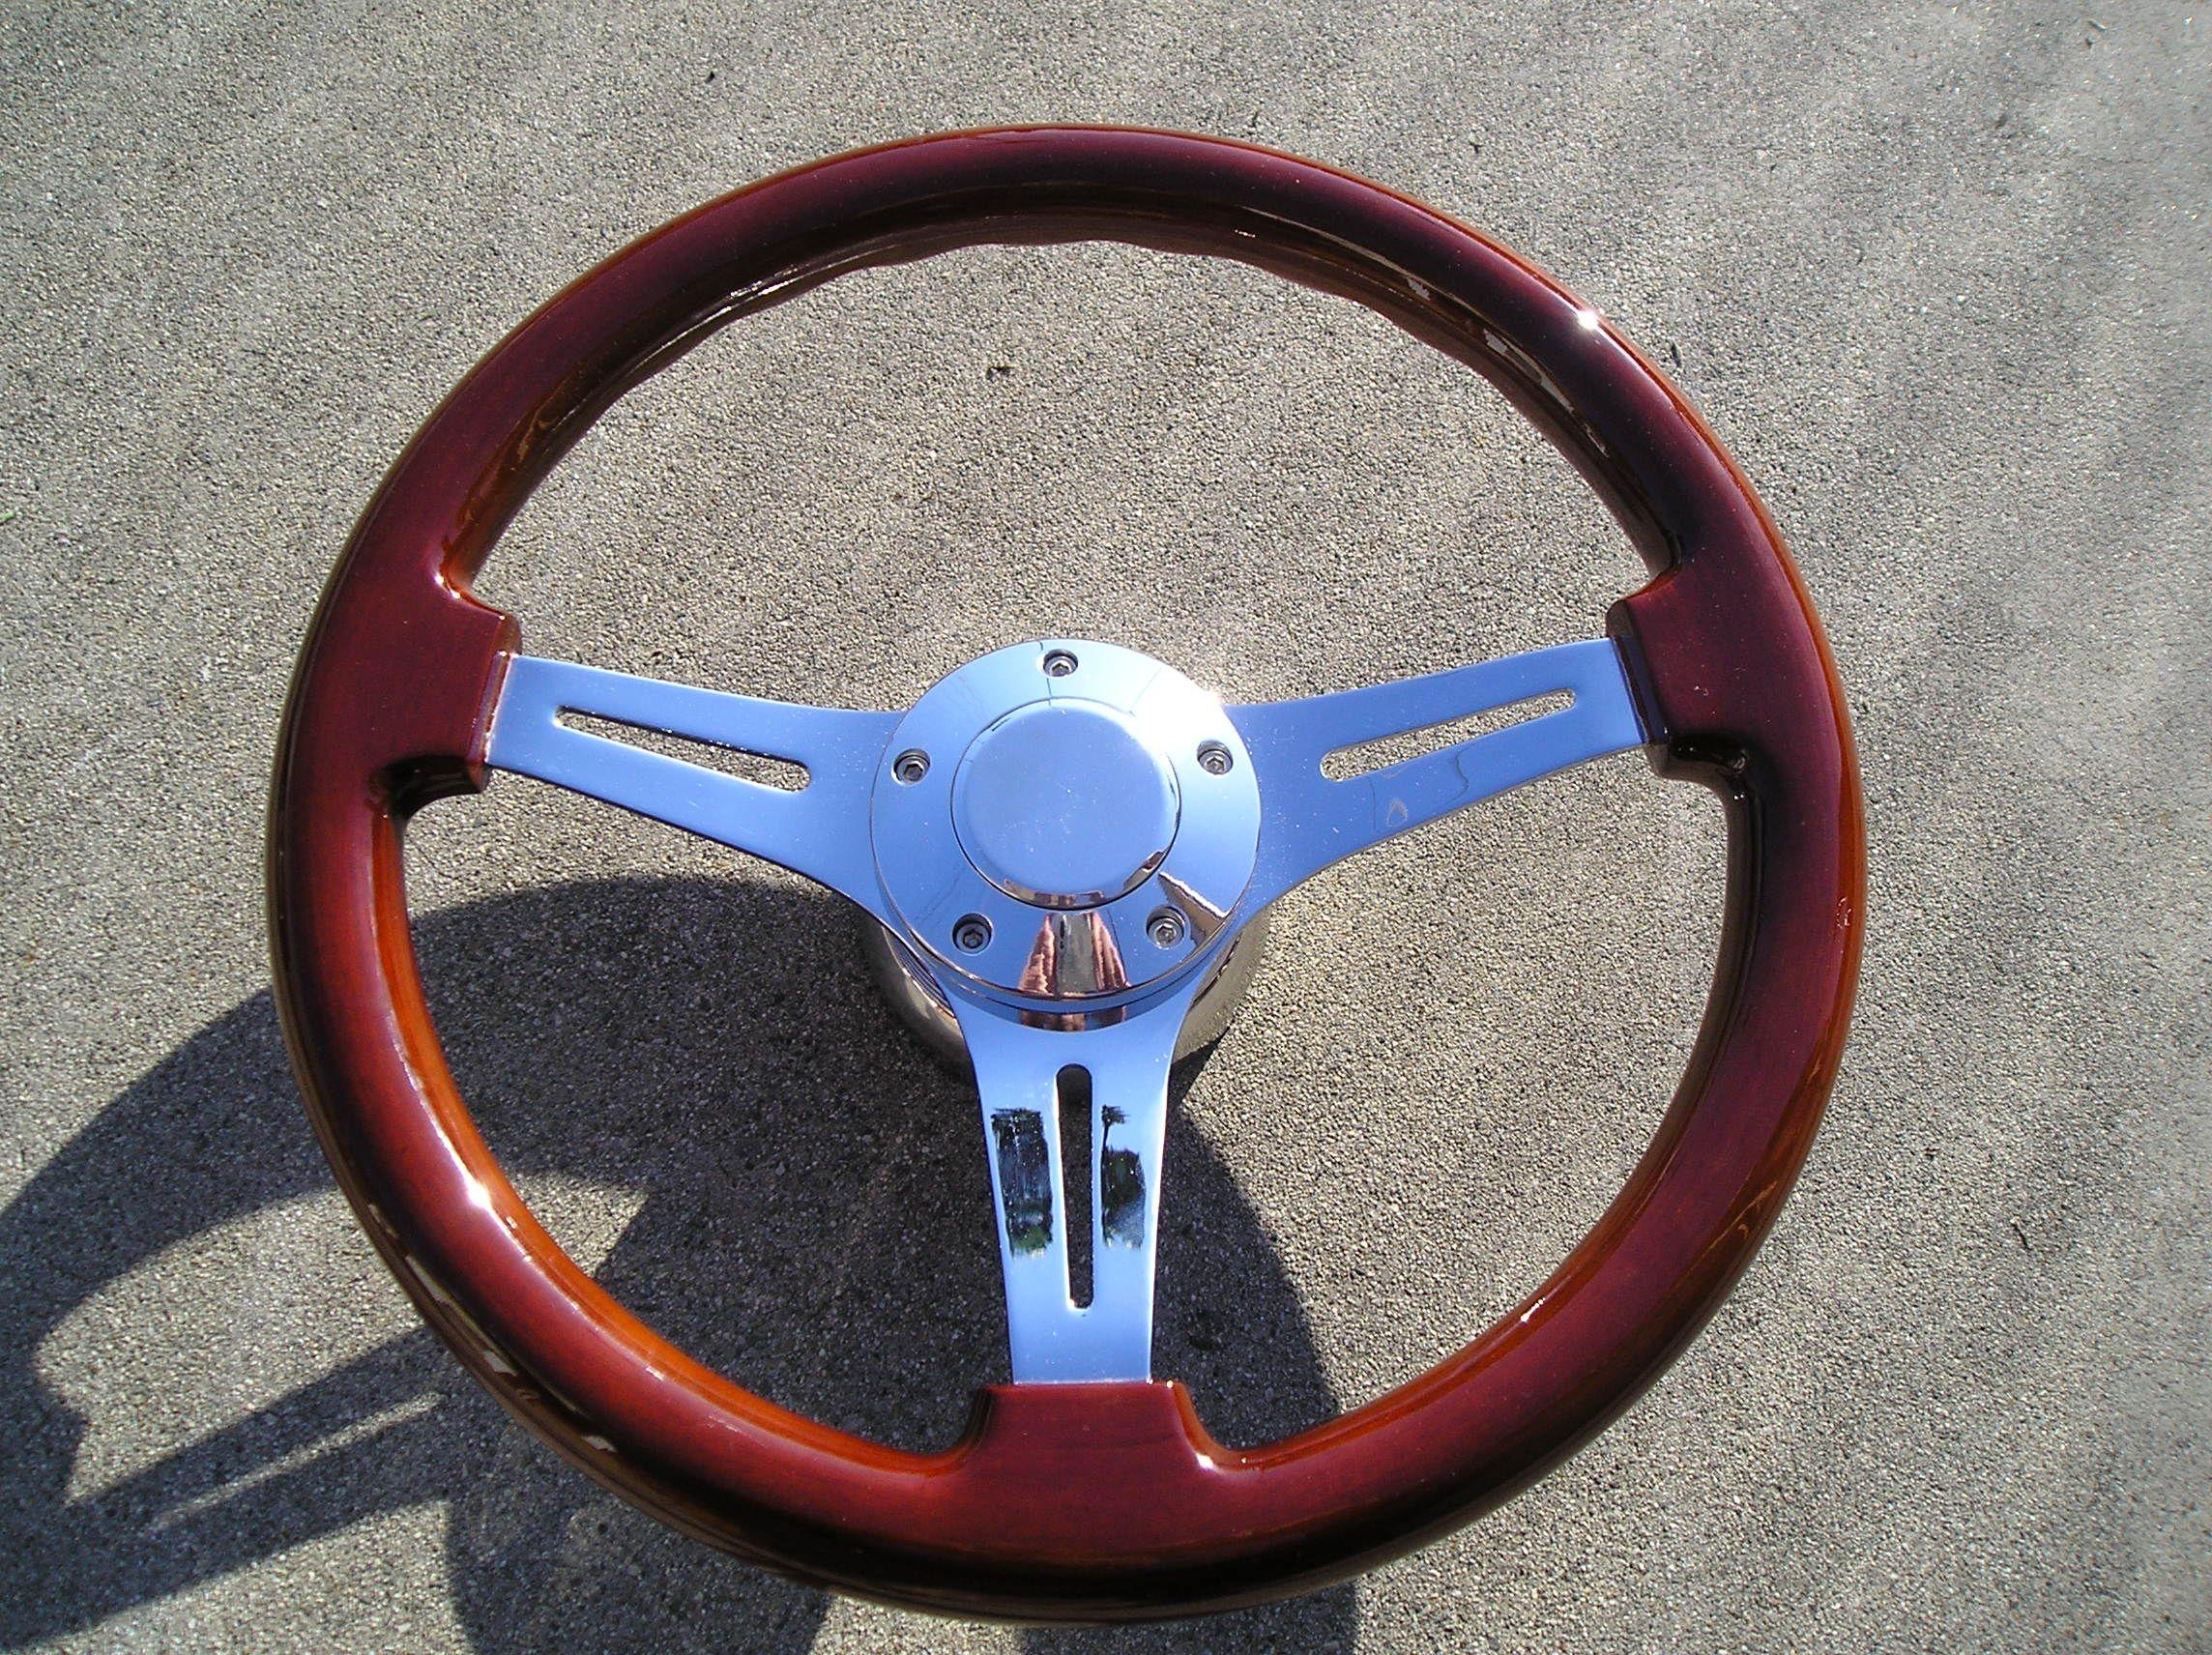 Mahogany wood steering wheel 14 + Adapter 4 chevy Ididit GM Jeep